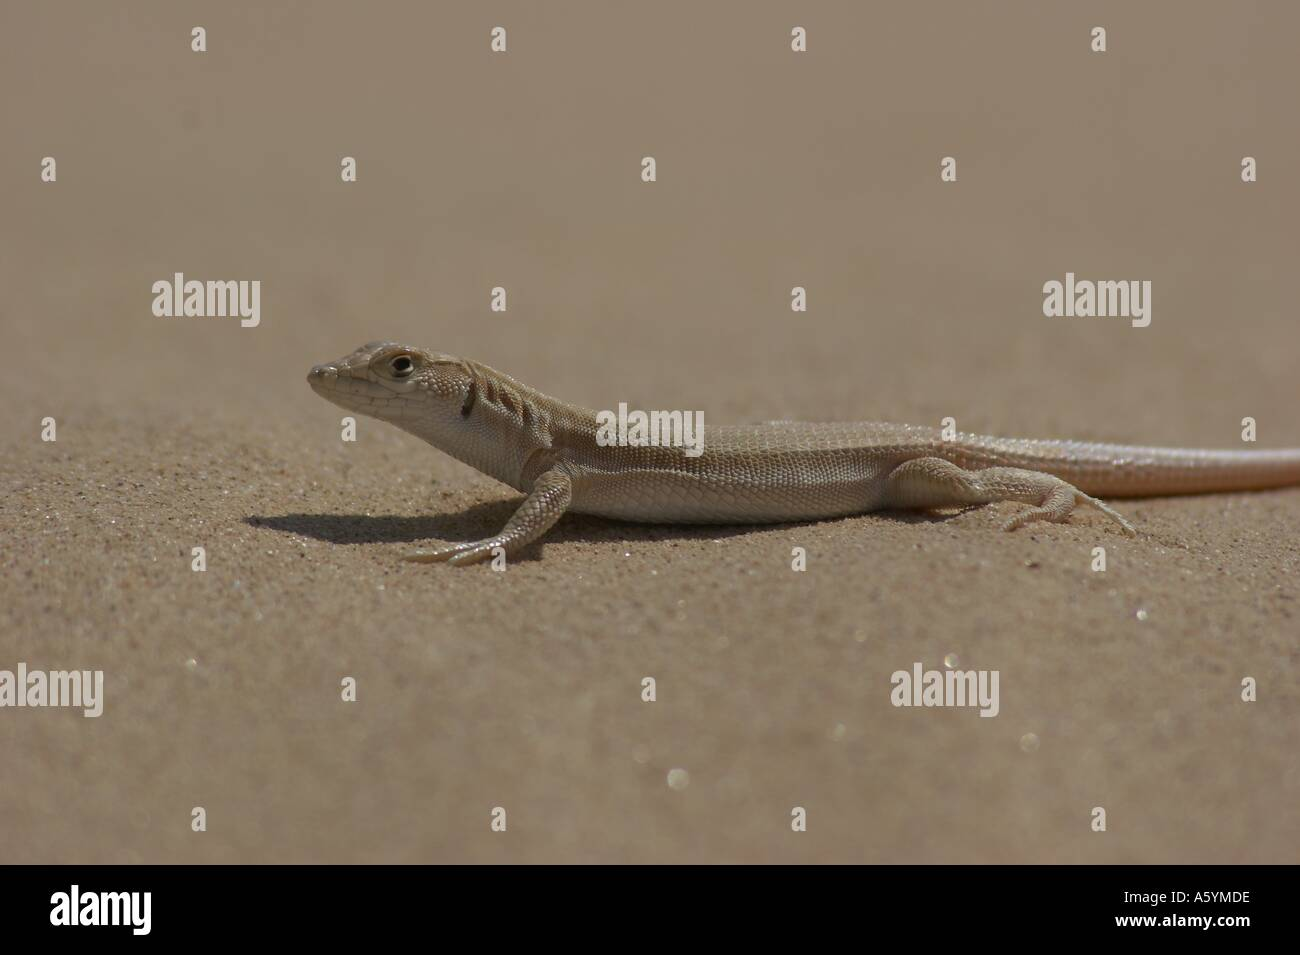 lizard in desert - Stock Image